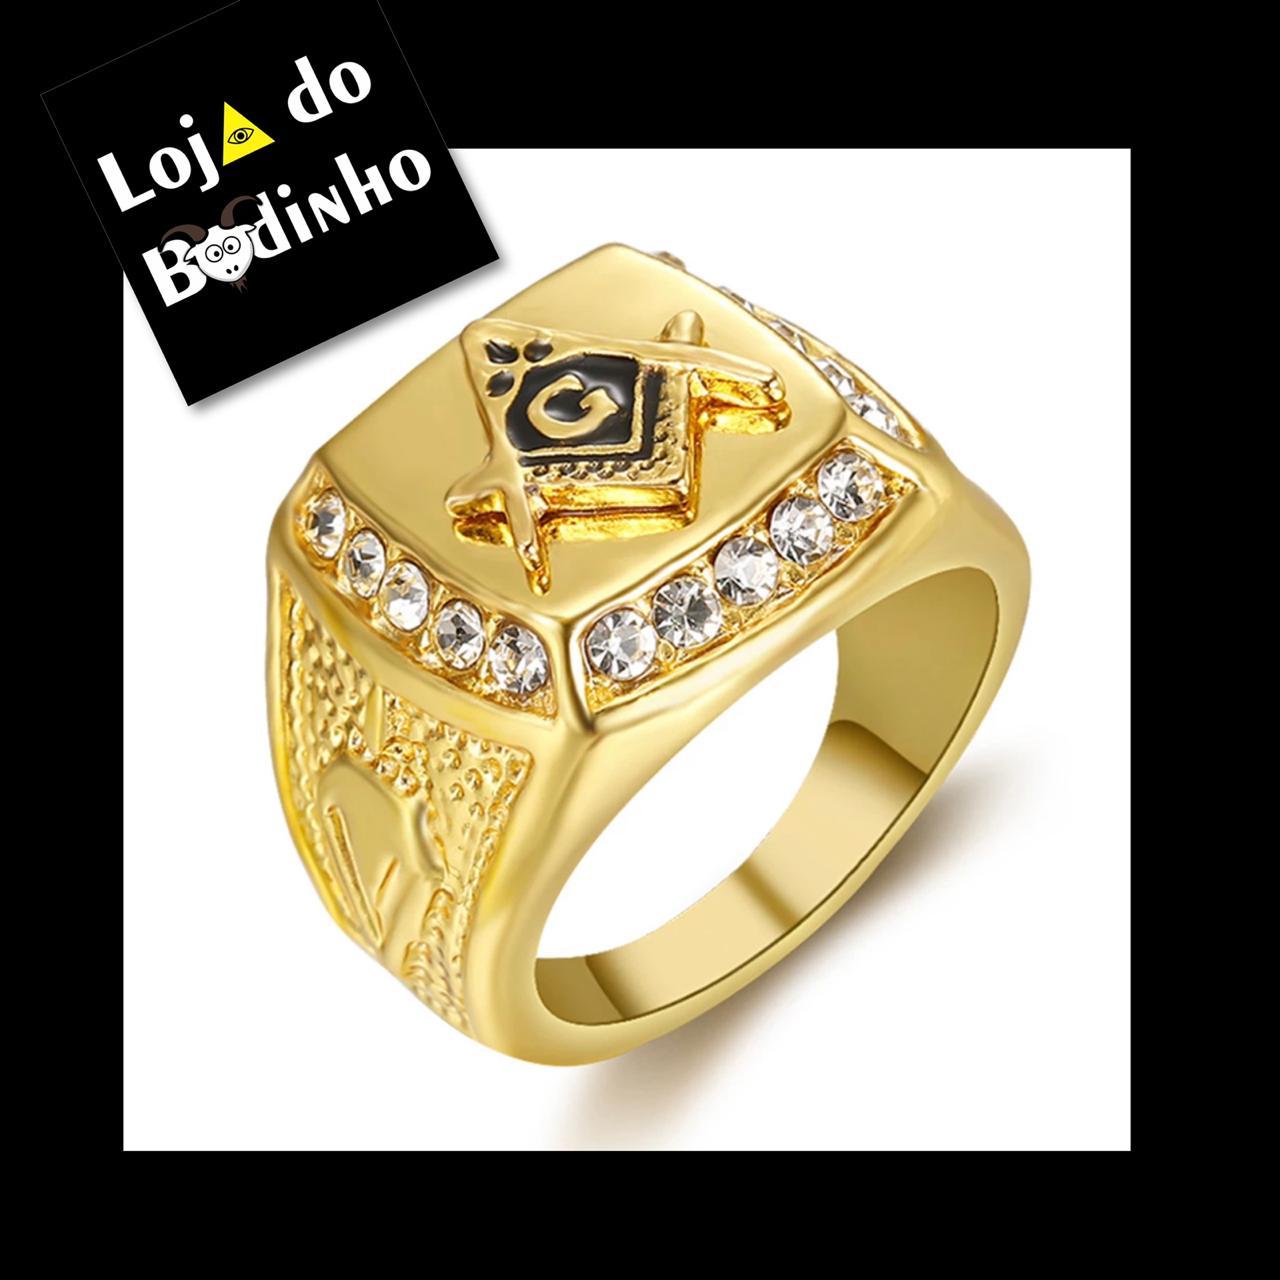 Anel Gold com Strass - Super Luxo